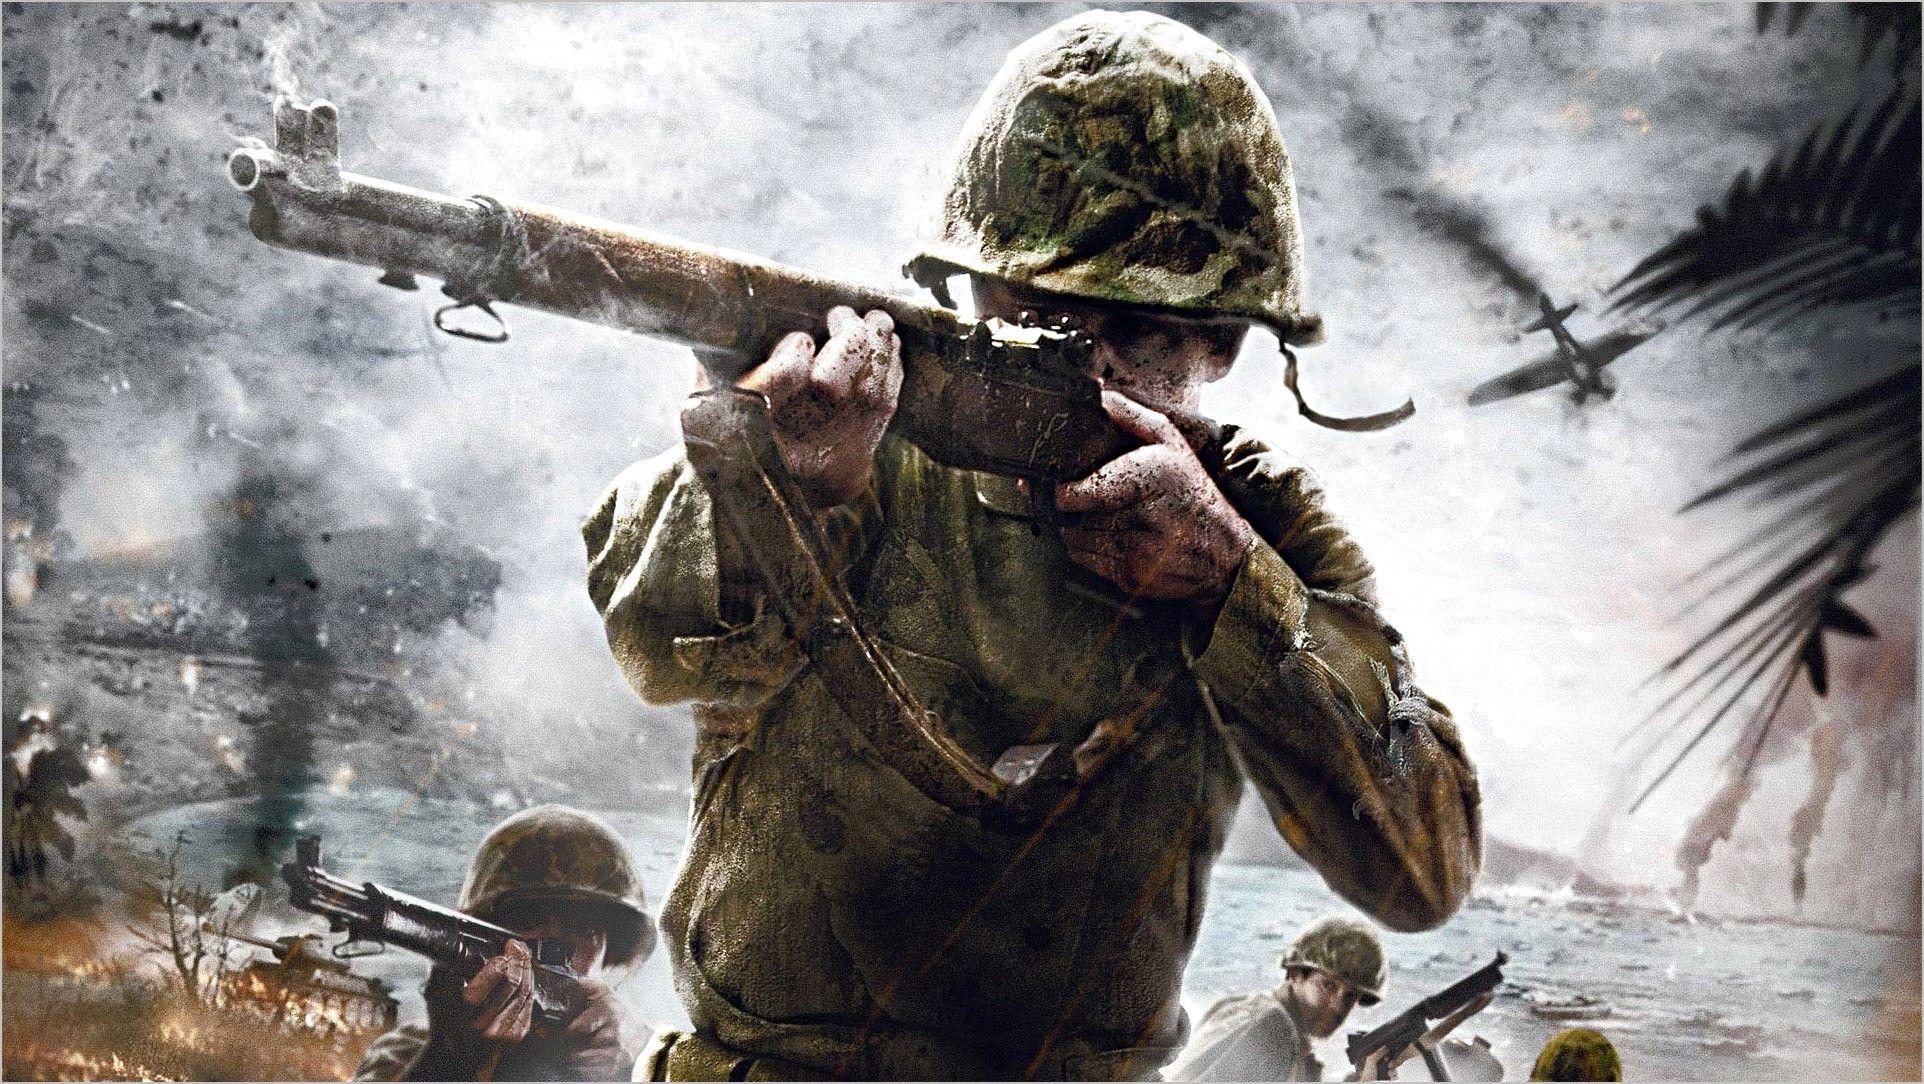 Cod Wwii Wallpaper 4k In 2020 Call Of Duty World Call Of Duty Modern War